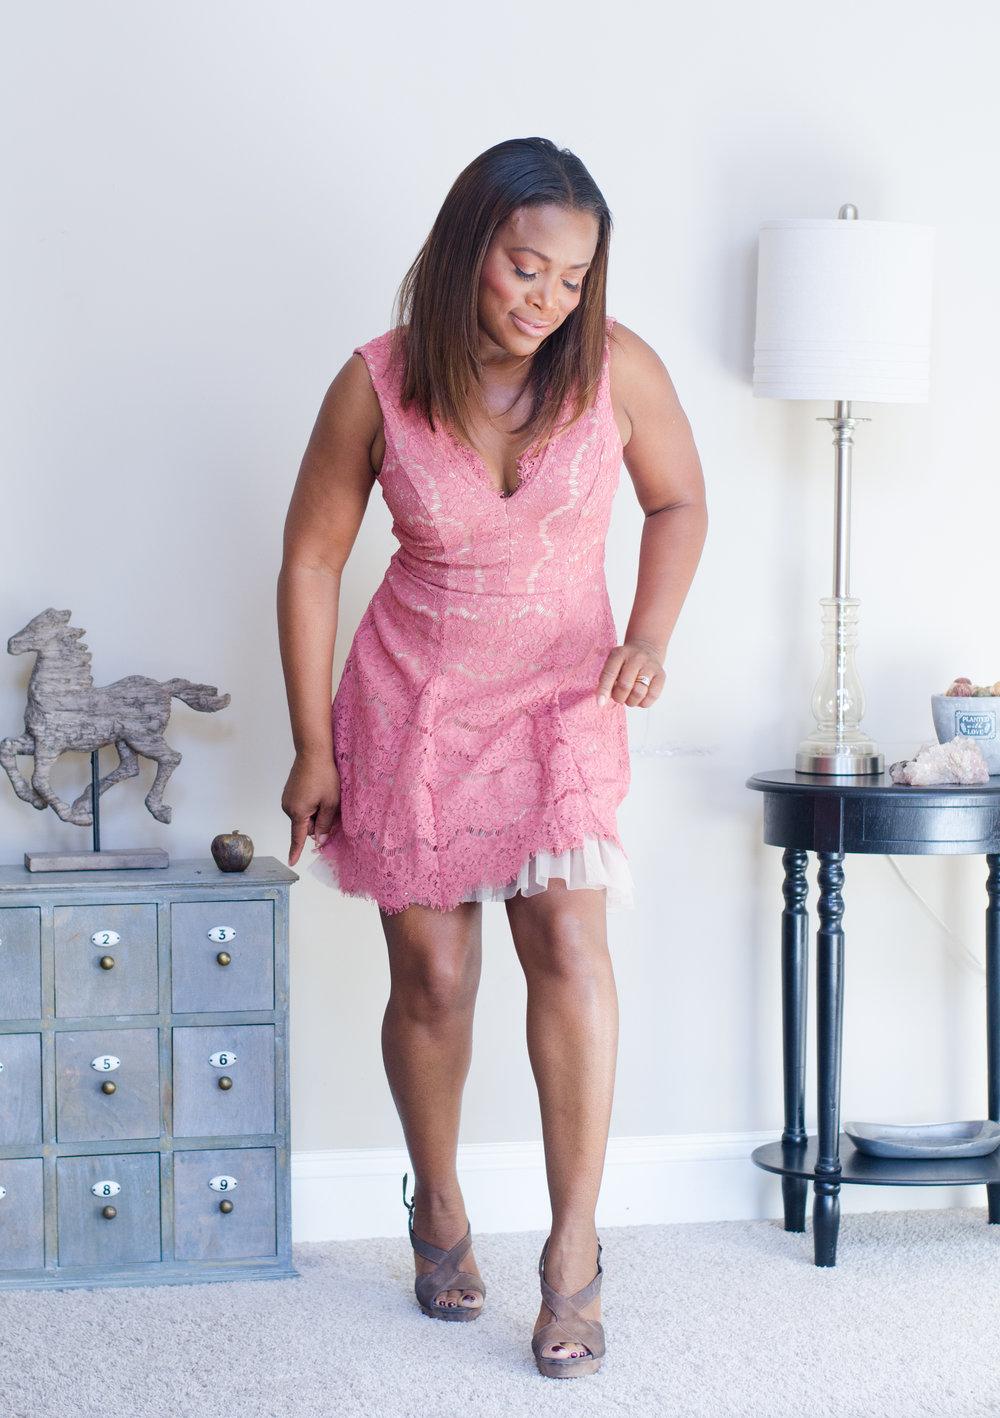 Lisa Pink Dress.jpg